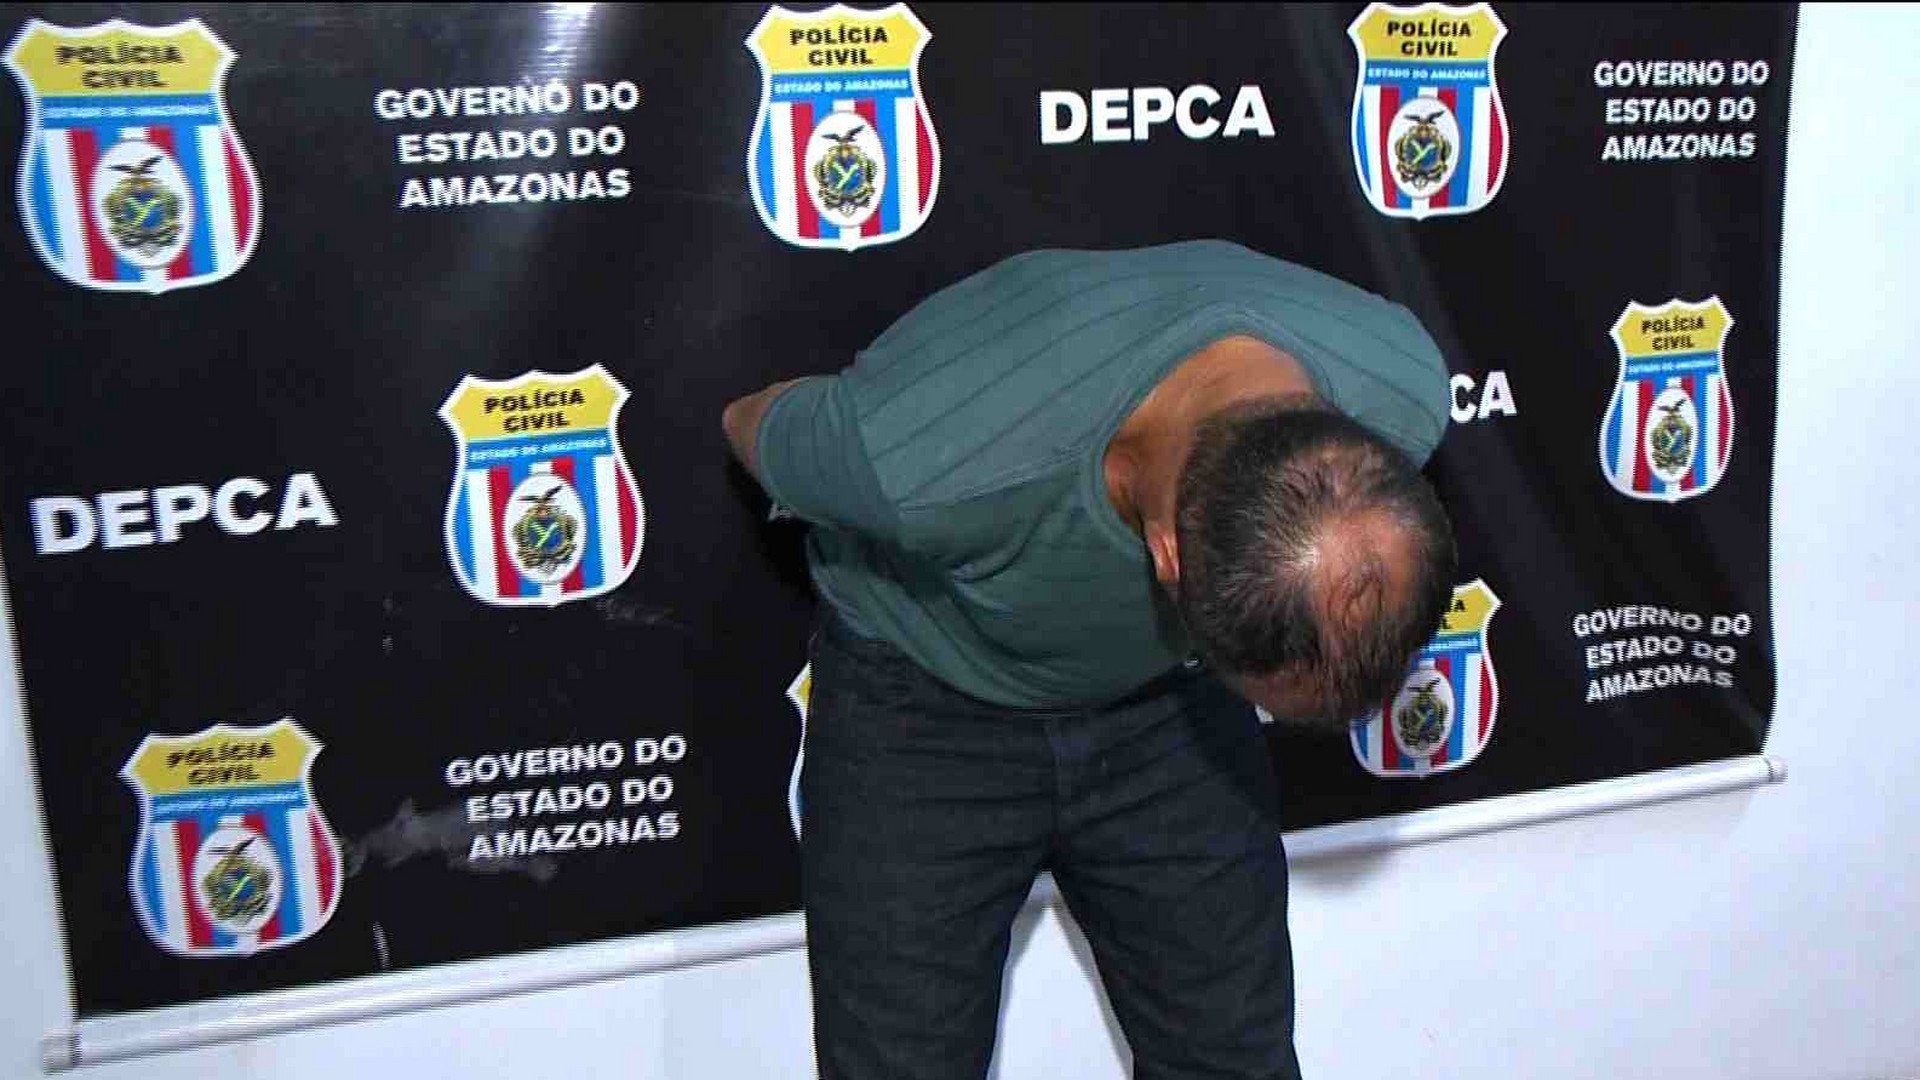 FLAGRANTE: FILHA DENUNCIA PAI POR ESTUPRO - Cidade Alerta Manaus - 12/12/17